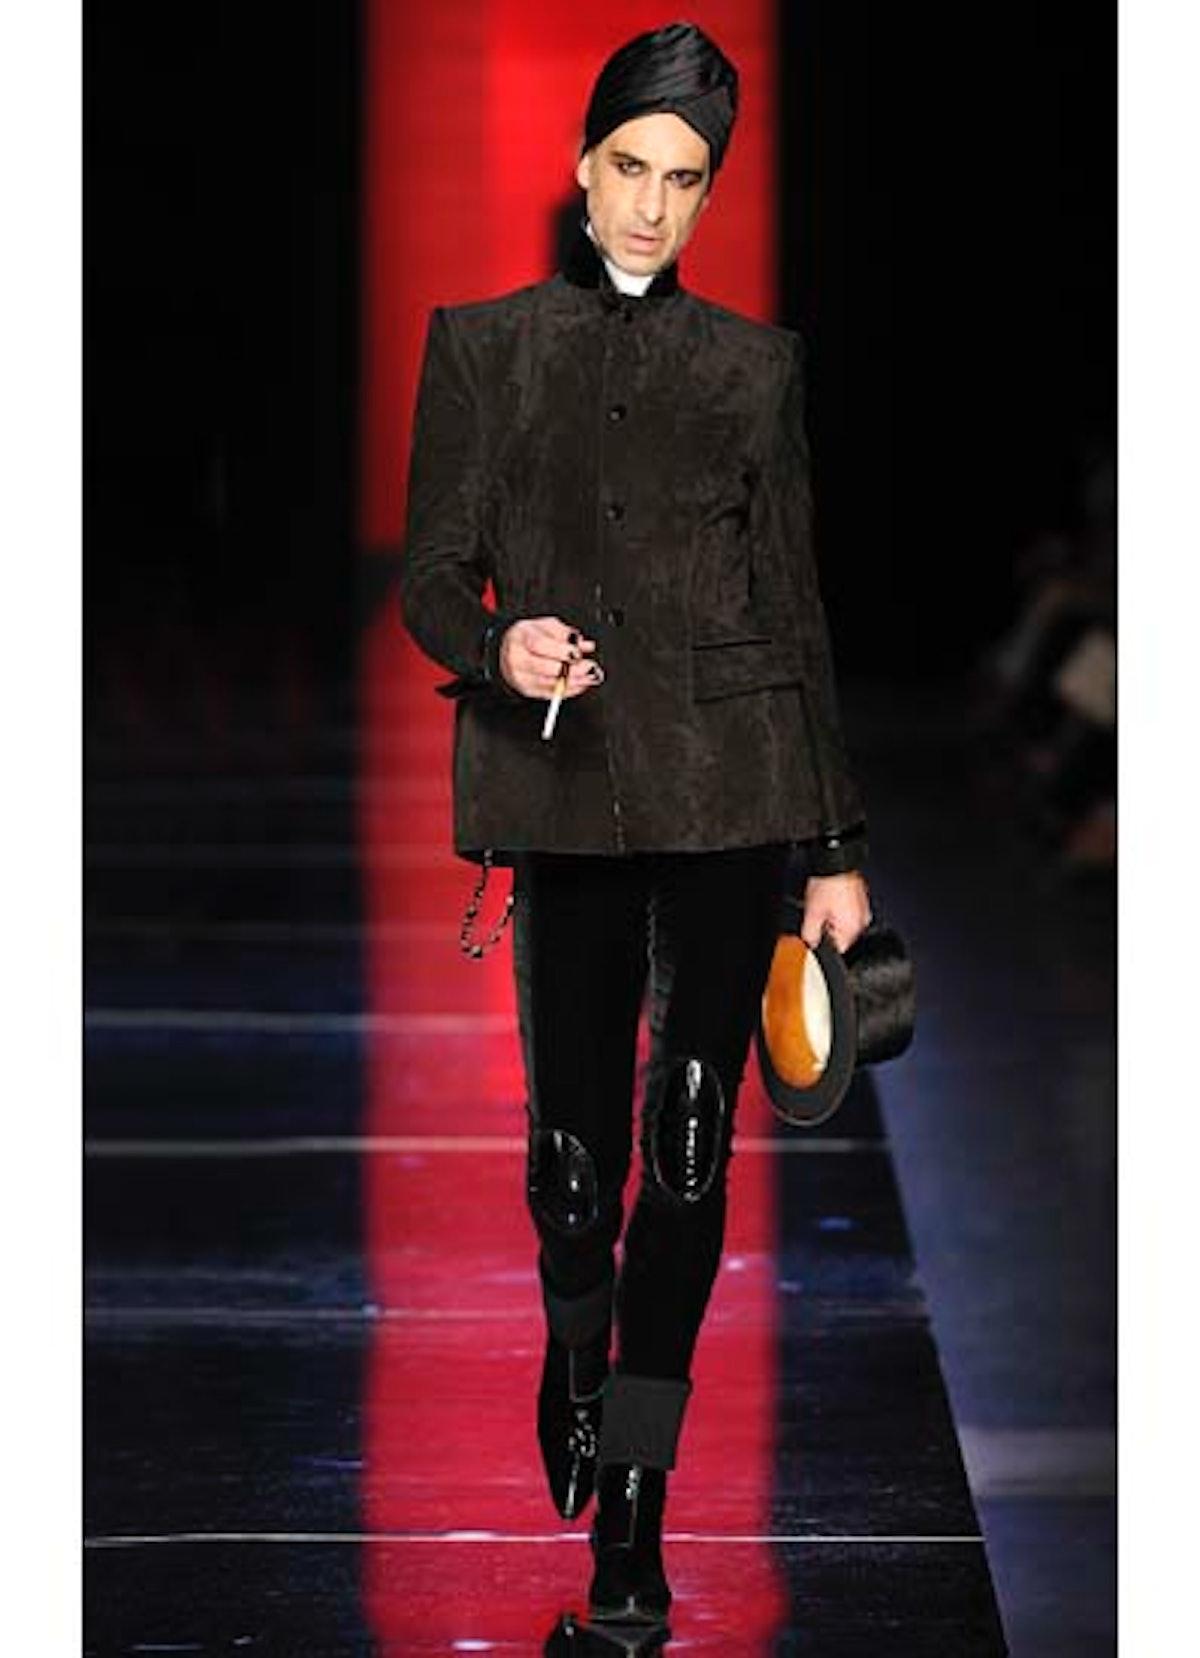 fass-jean-paul-gaultier-couture-2012-runway-04-v.jpg